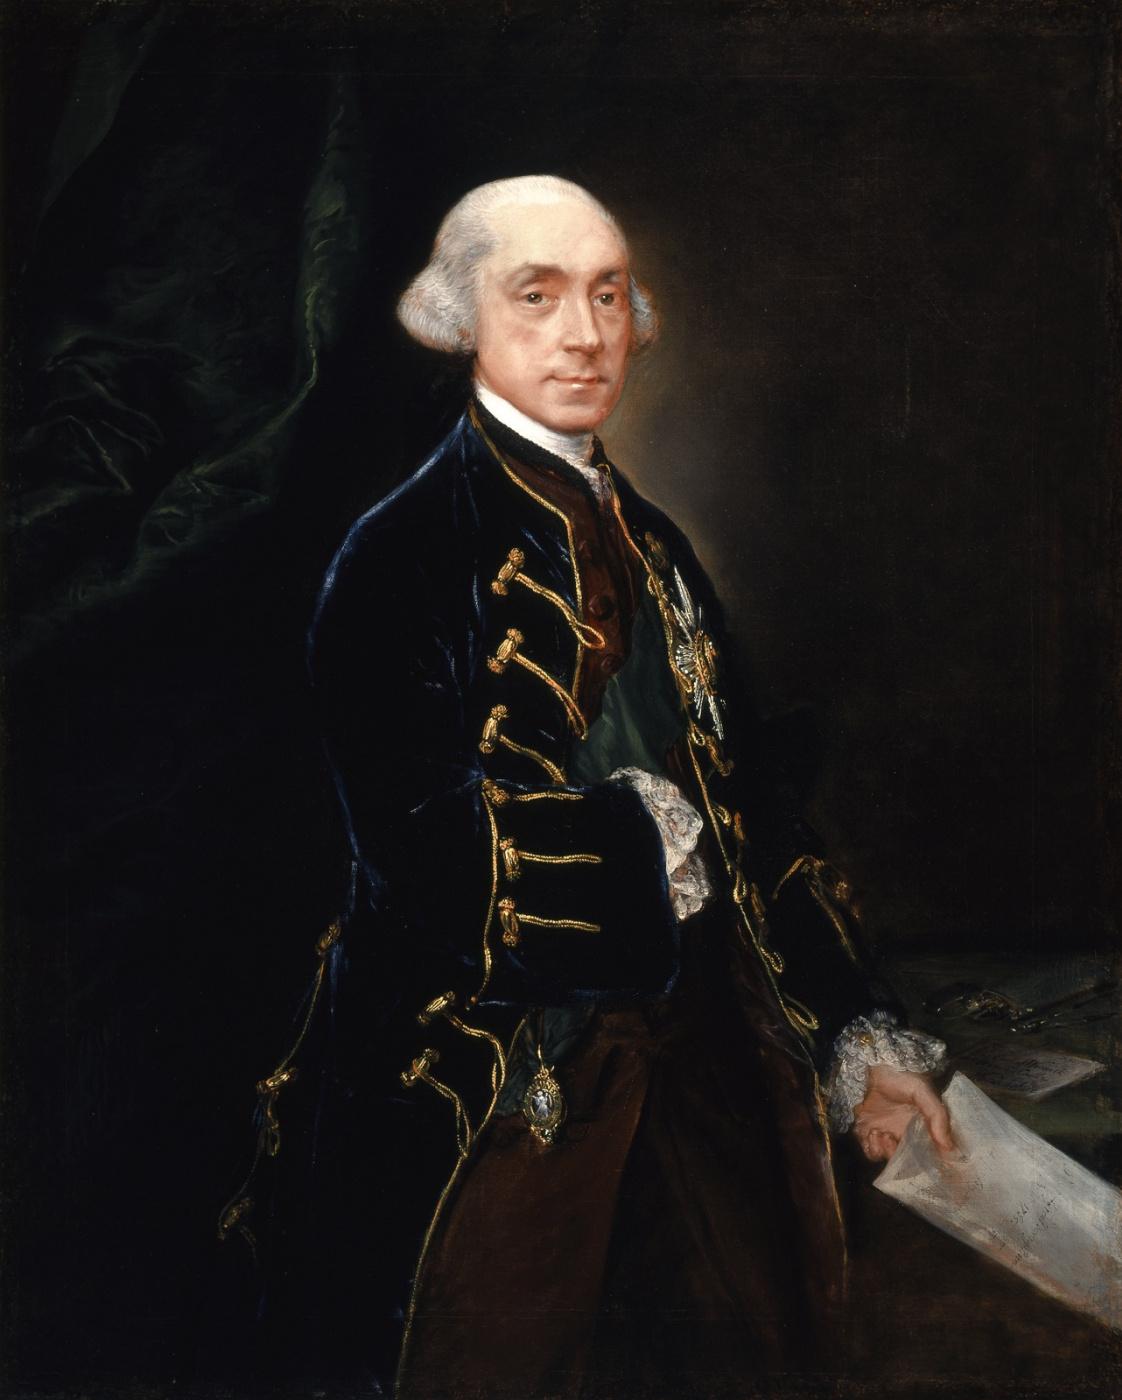 Thomas Gainsborough. Francis Greville, 1st Earl of Warwick